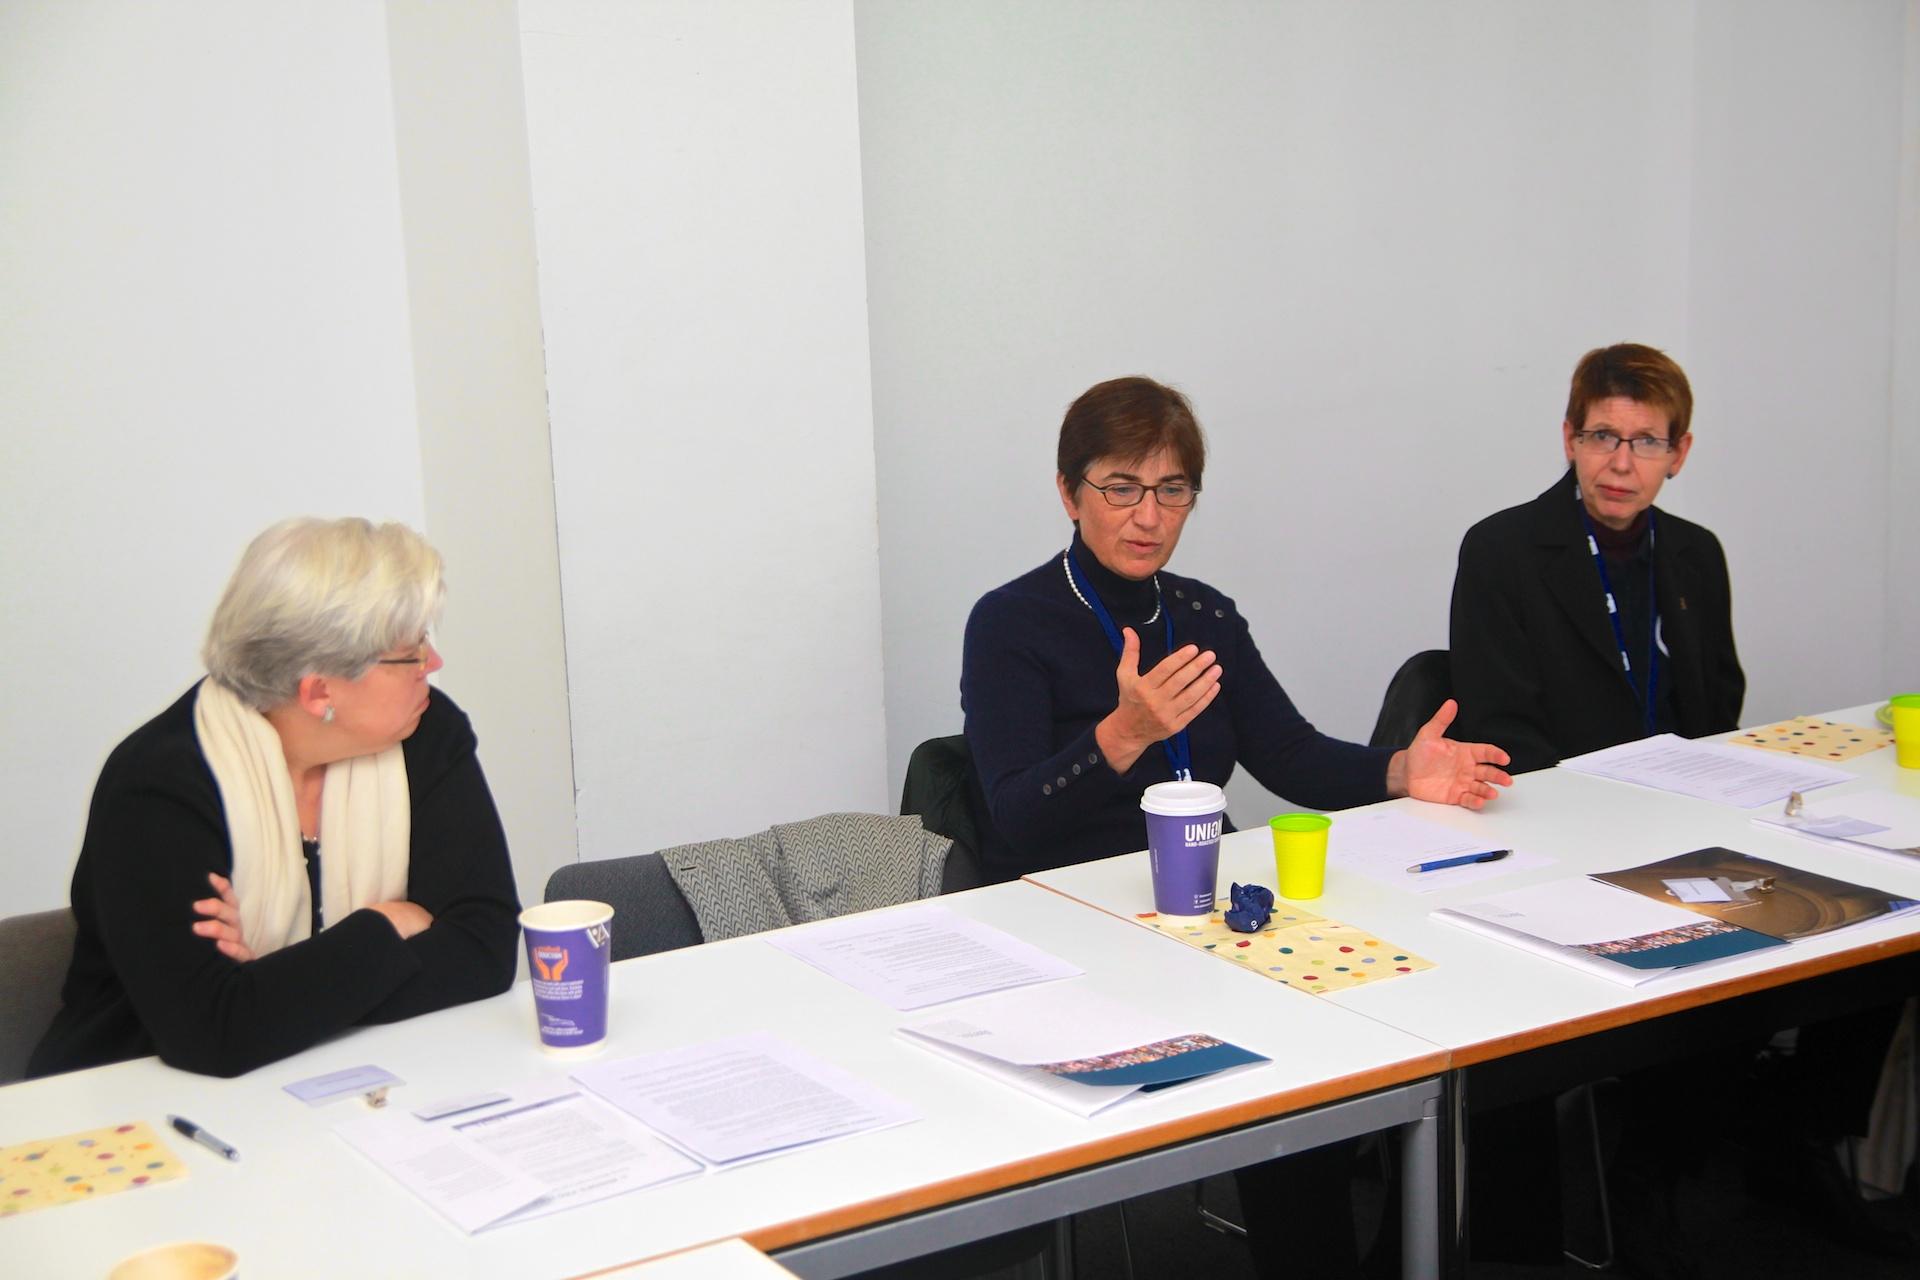 Scholars Barbara Grewe, Susan Karamanian and Charalee Graydon